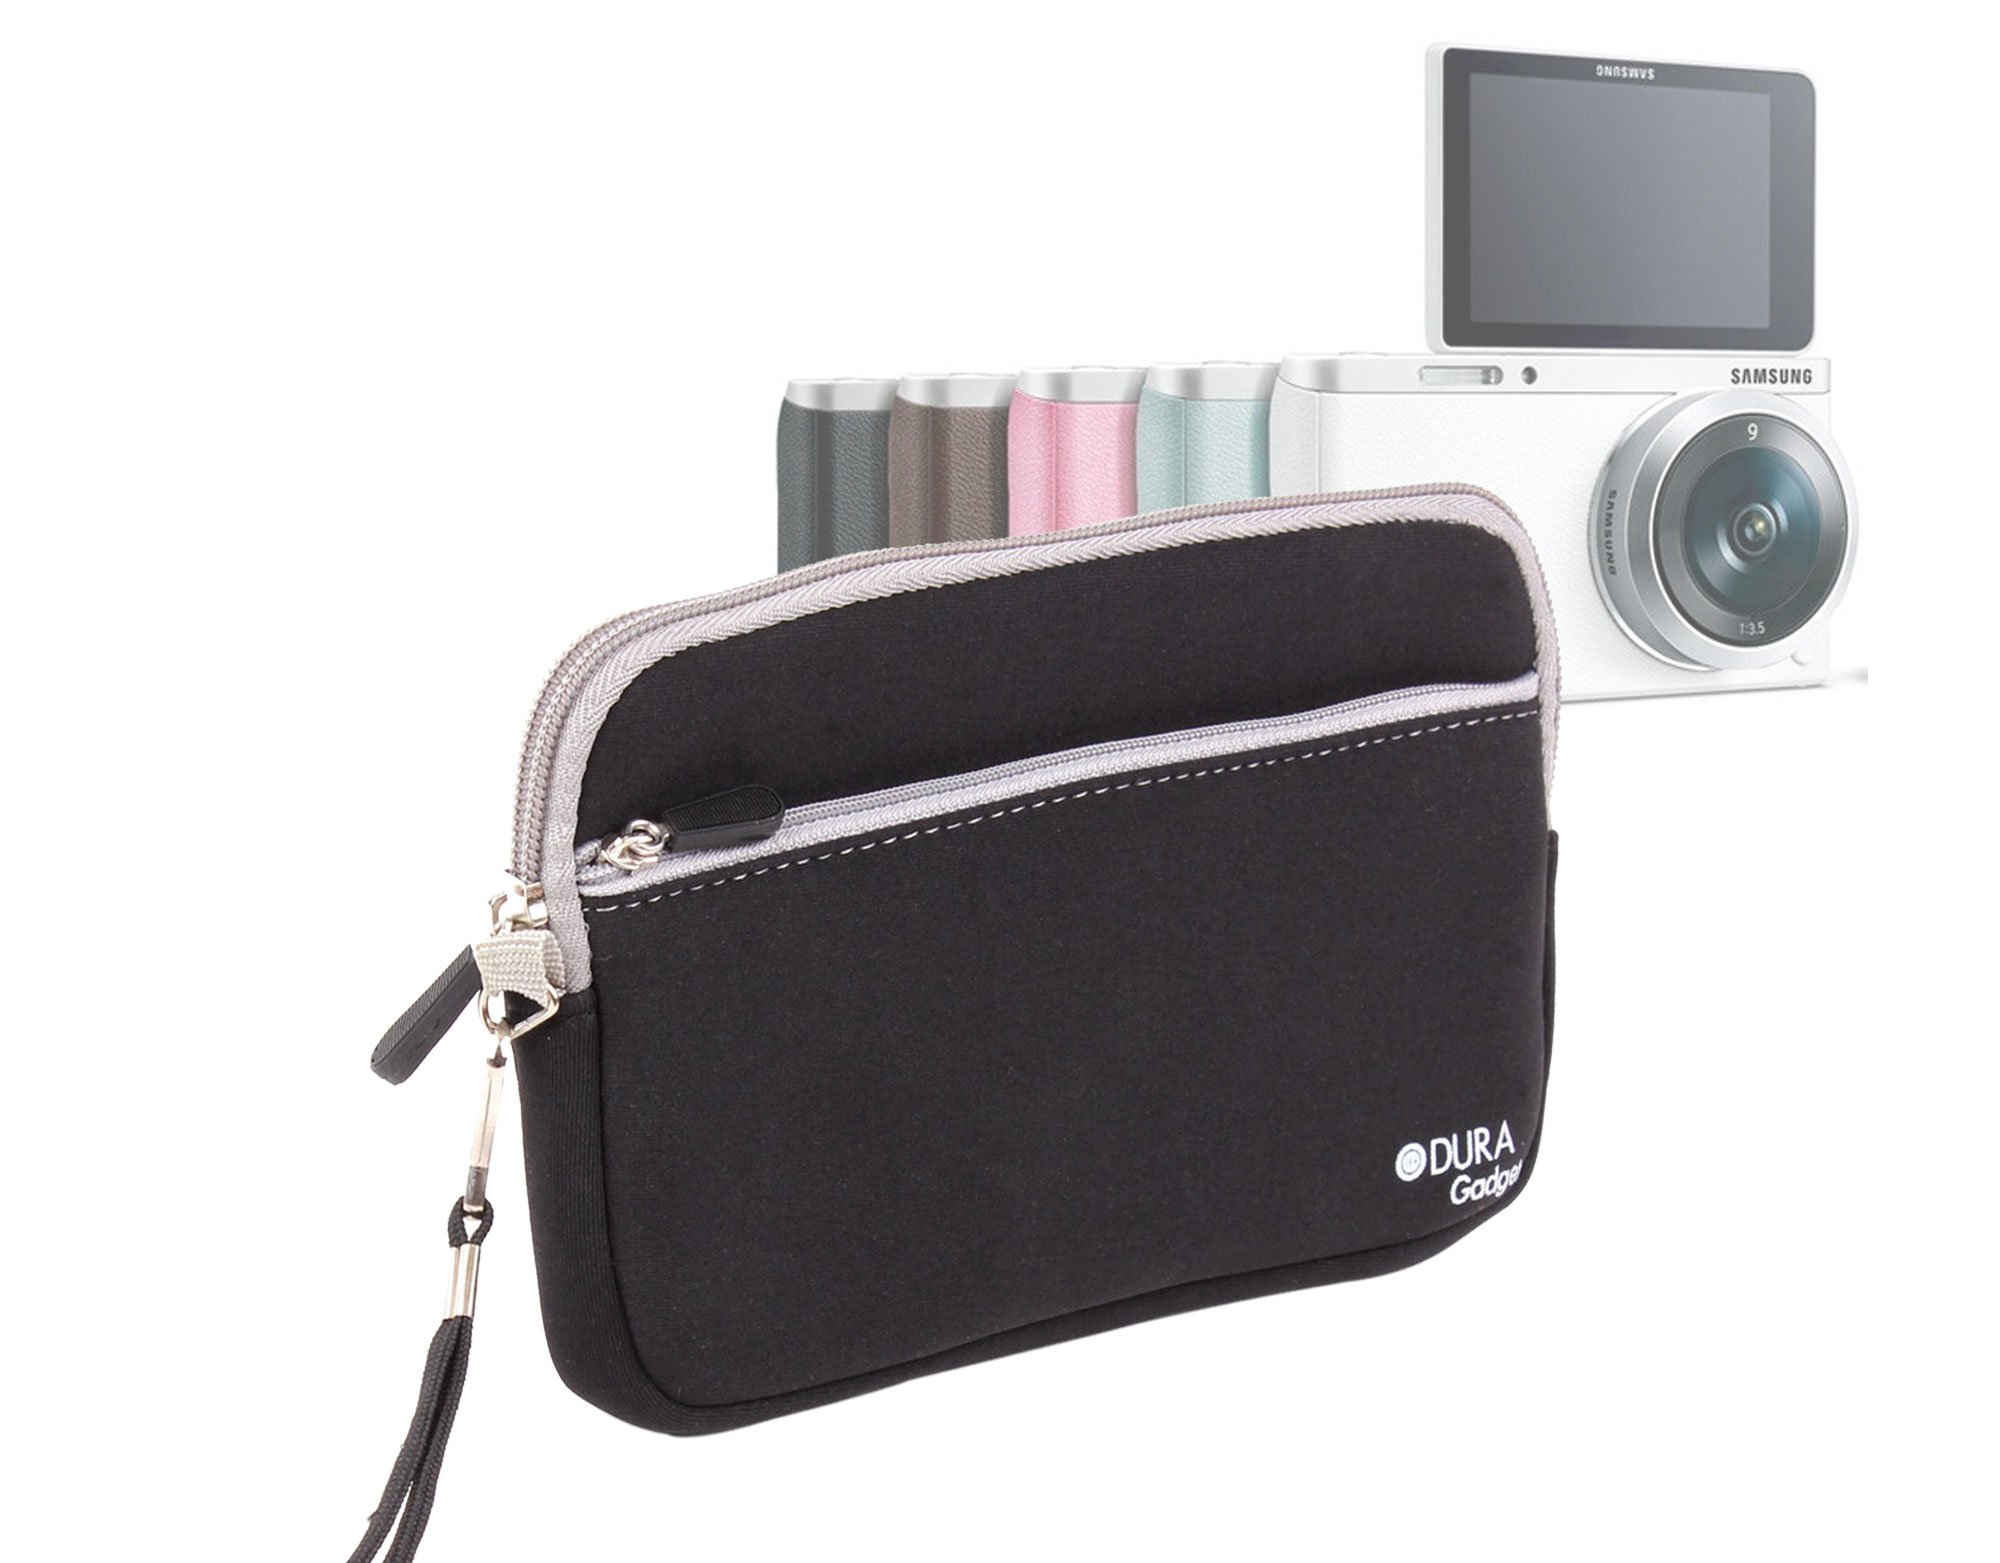 DURAGADGET Black Compact Camera Case With Secure Zip Closure For Samsung NX Mini Smart Camera